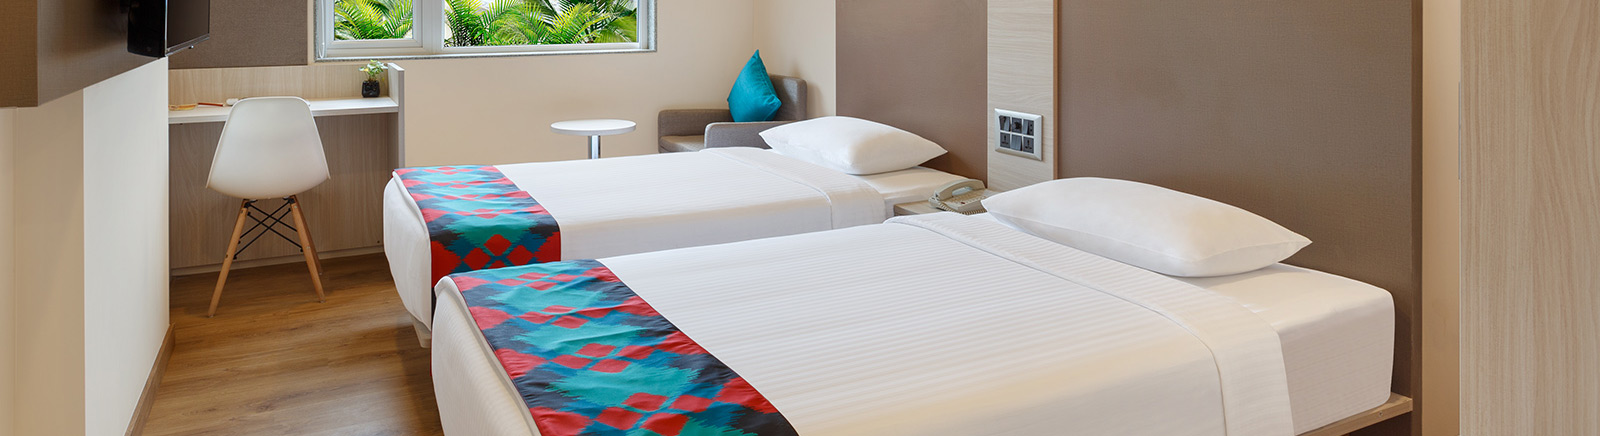 Ginger Surat Hotel Rooms